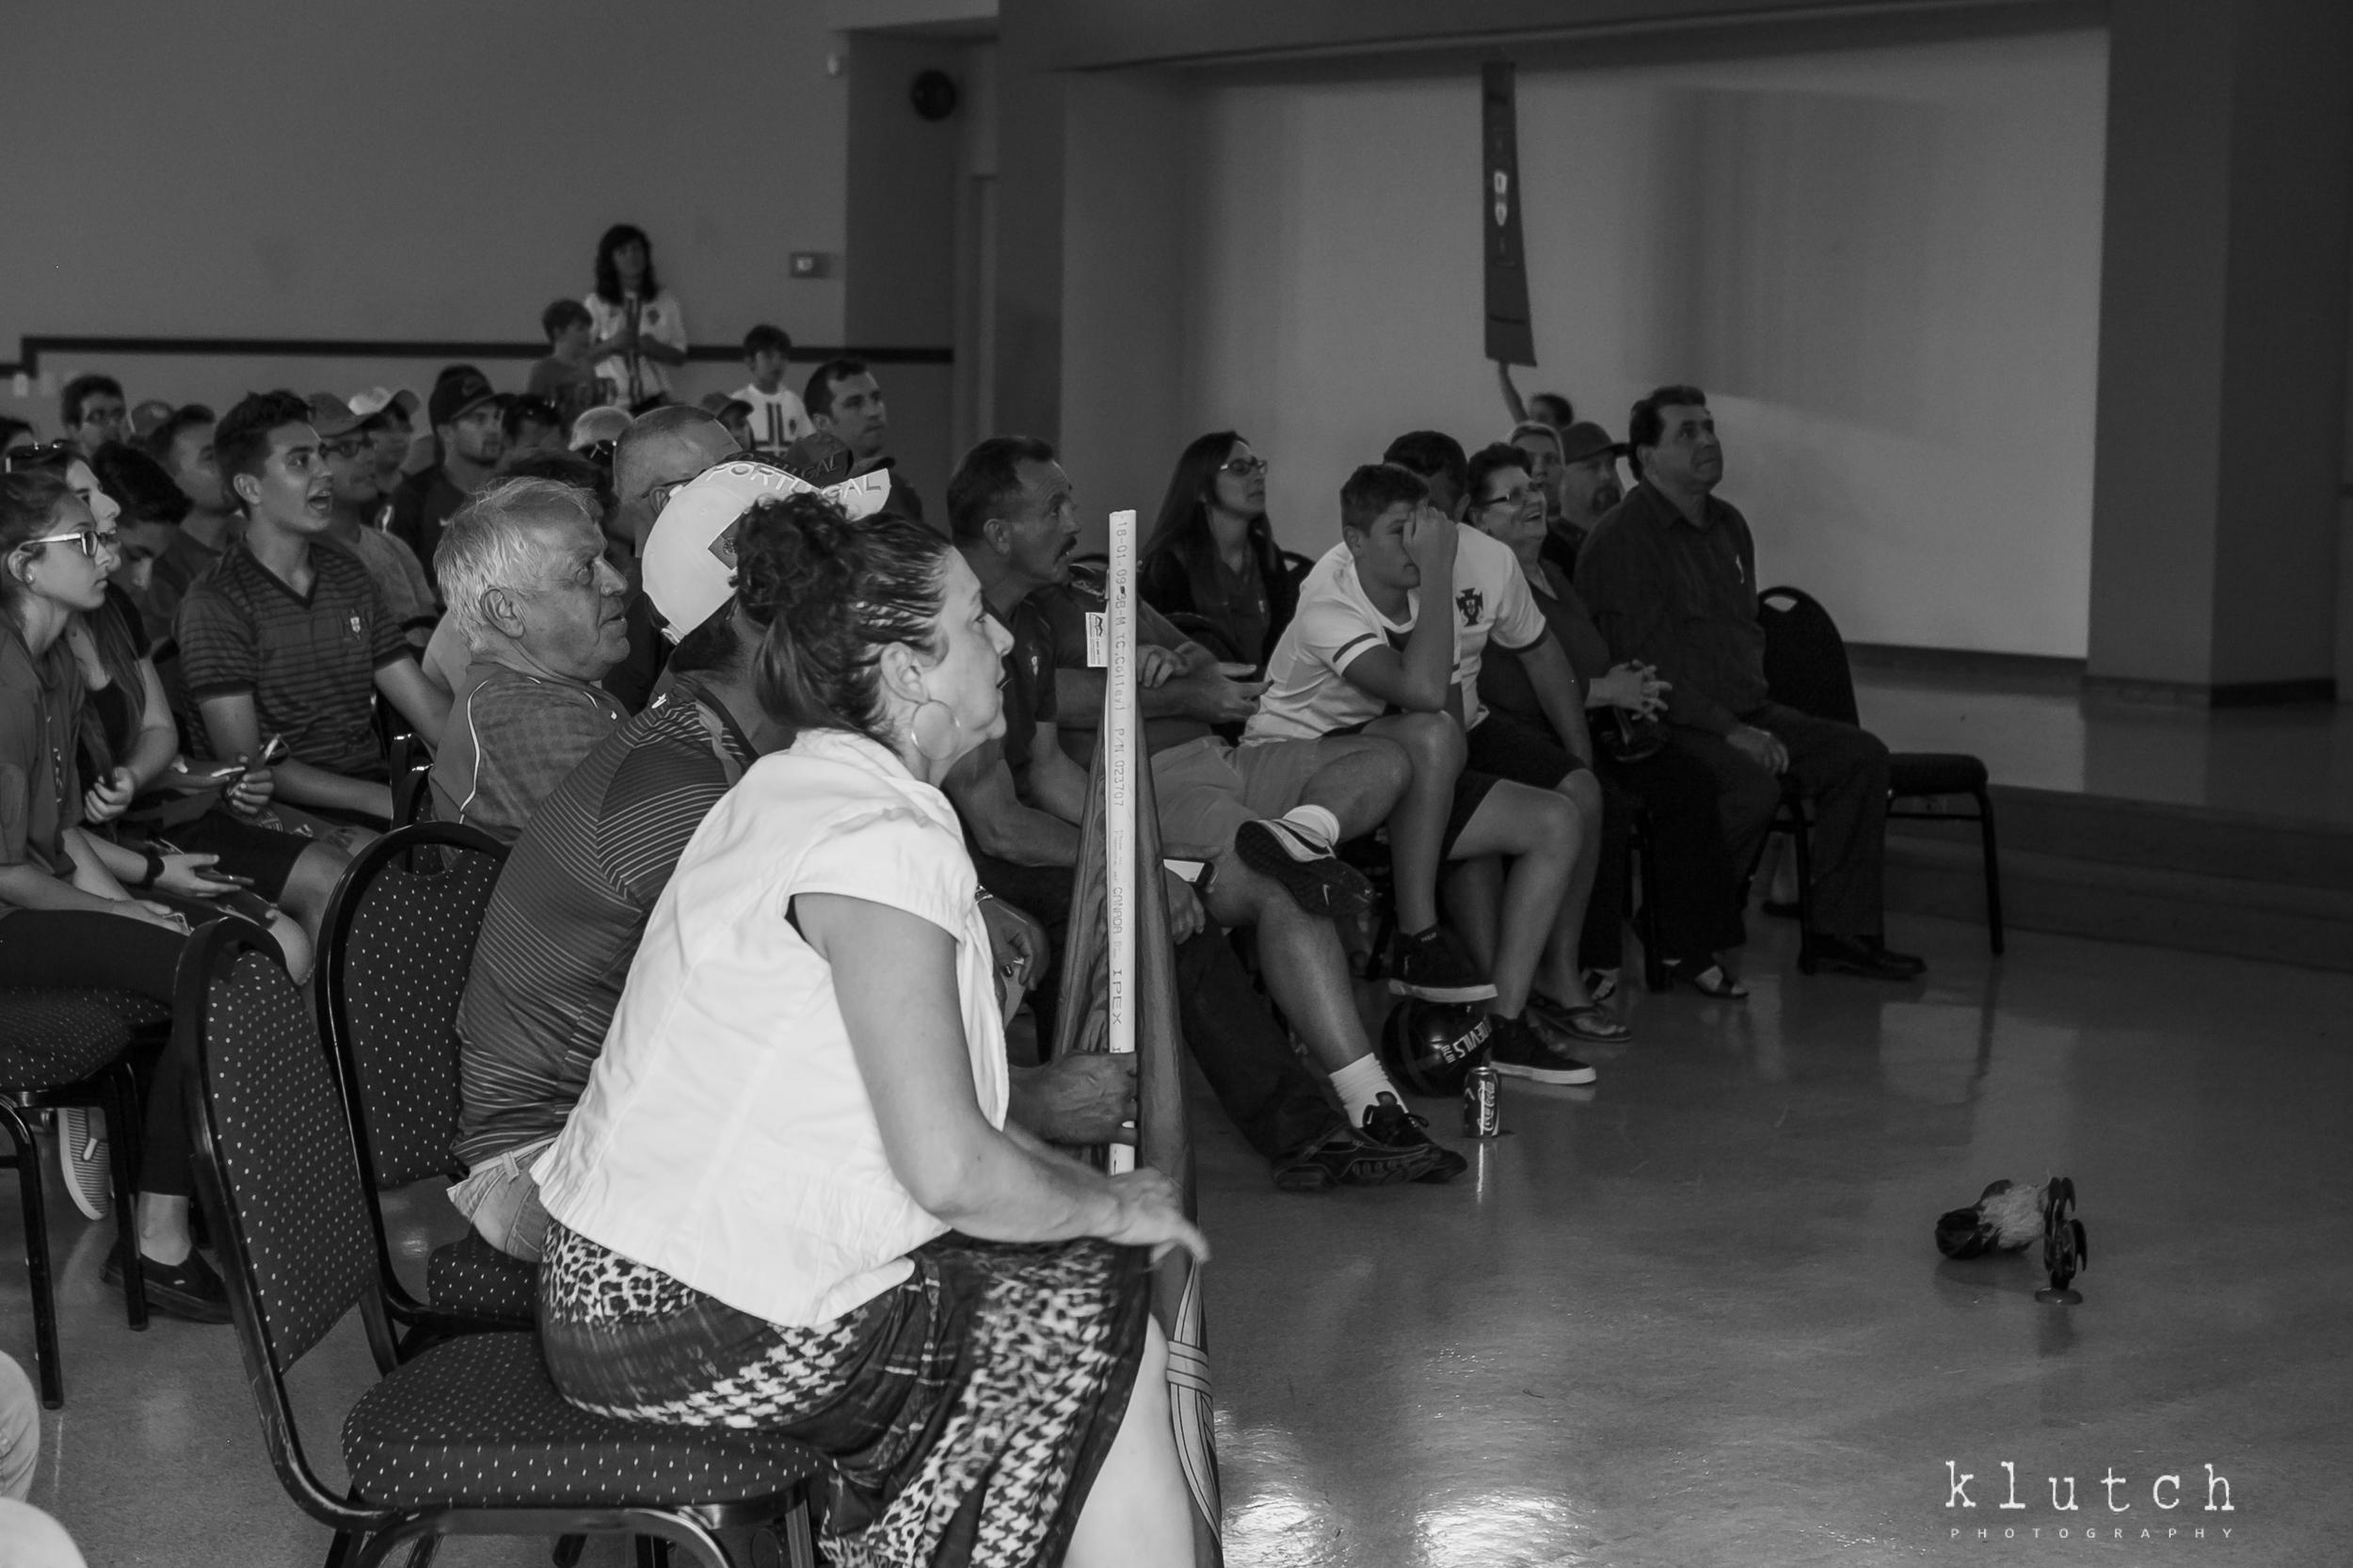 Klutch Photography, vancouver family photographer, surrey family photographer, vancouver newnorn photographer, surrey newborn photographer, candid photography, lifestlye photography, lifeunscripted photographer, -2-27.jpg